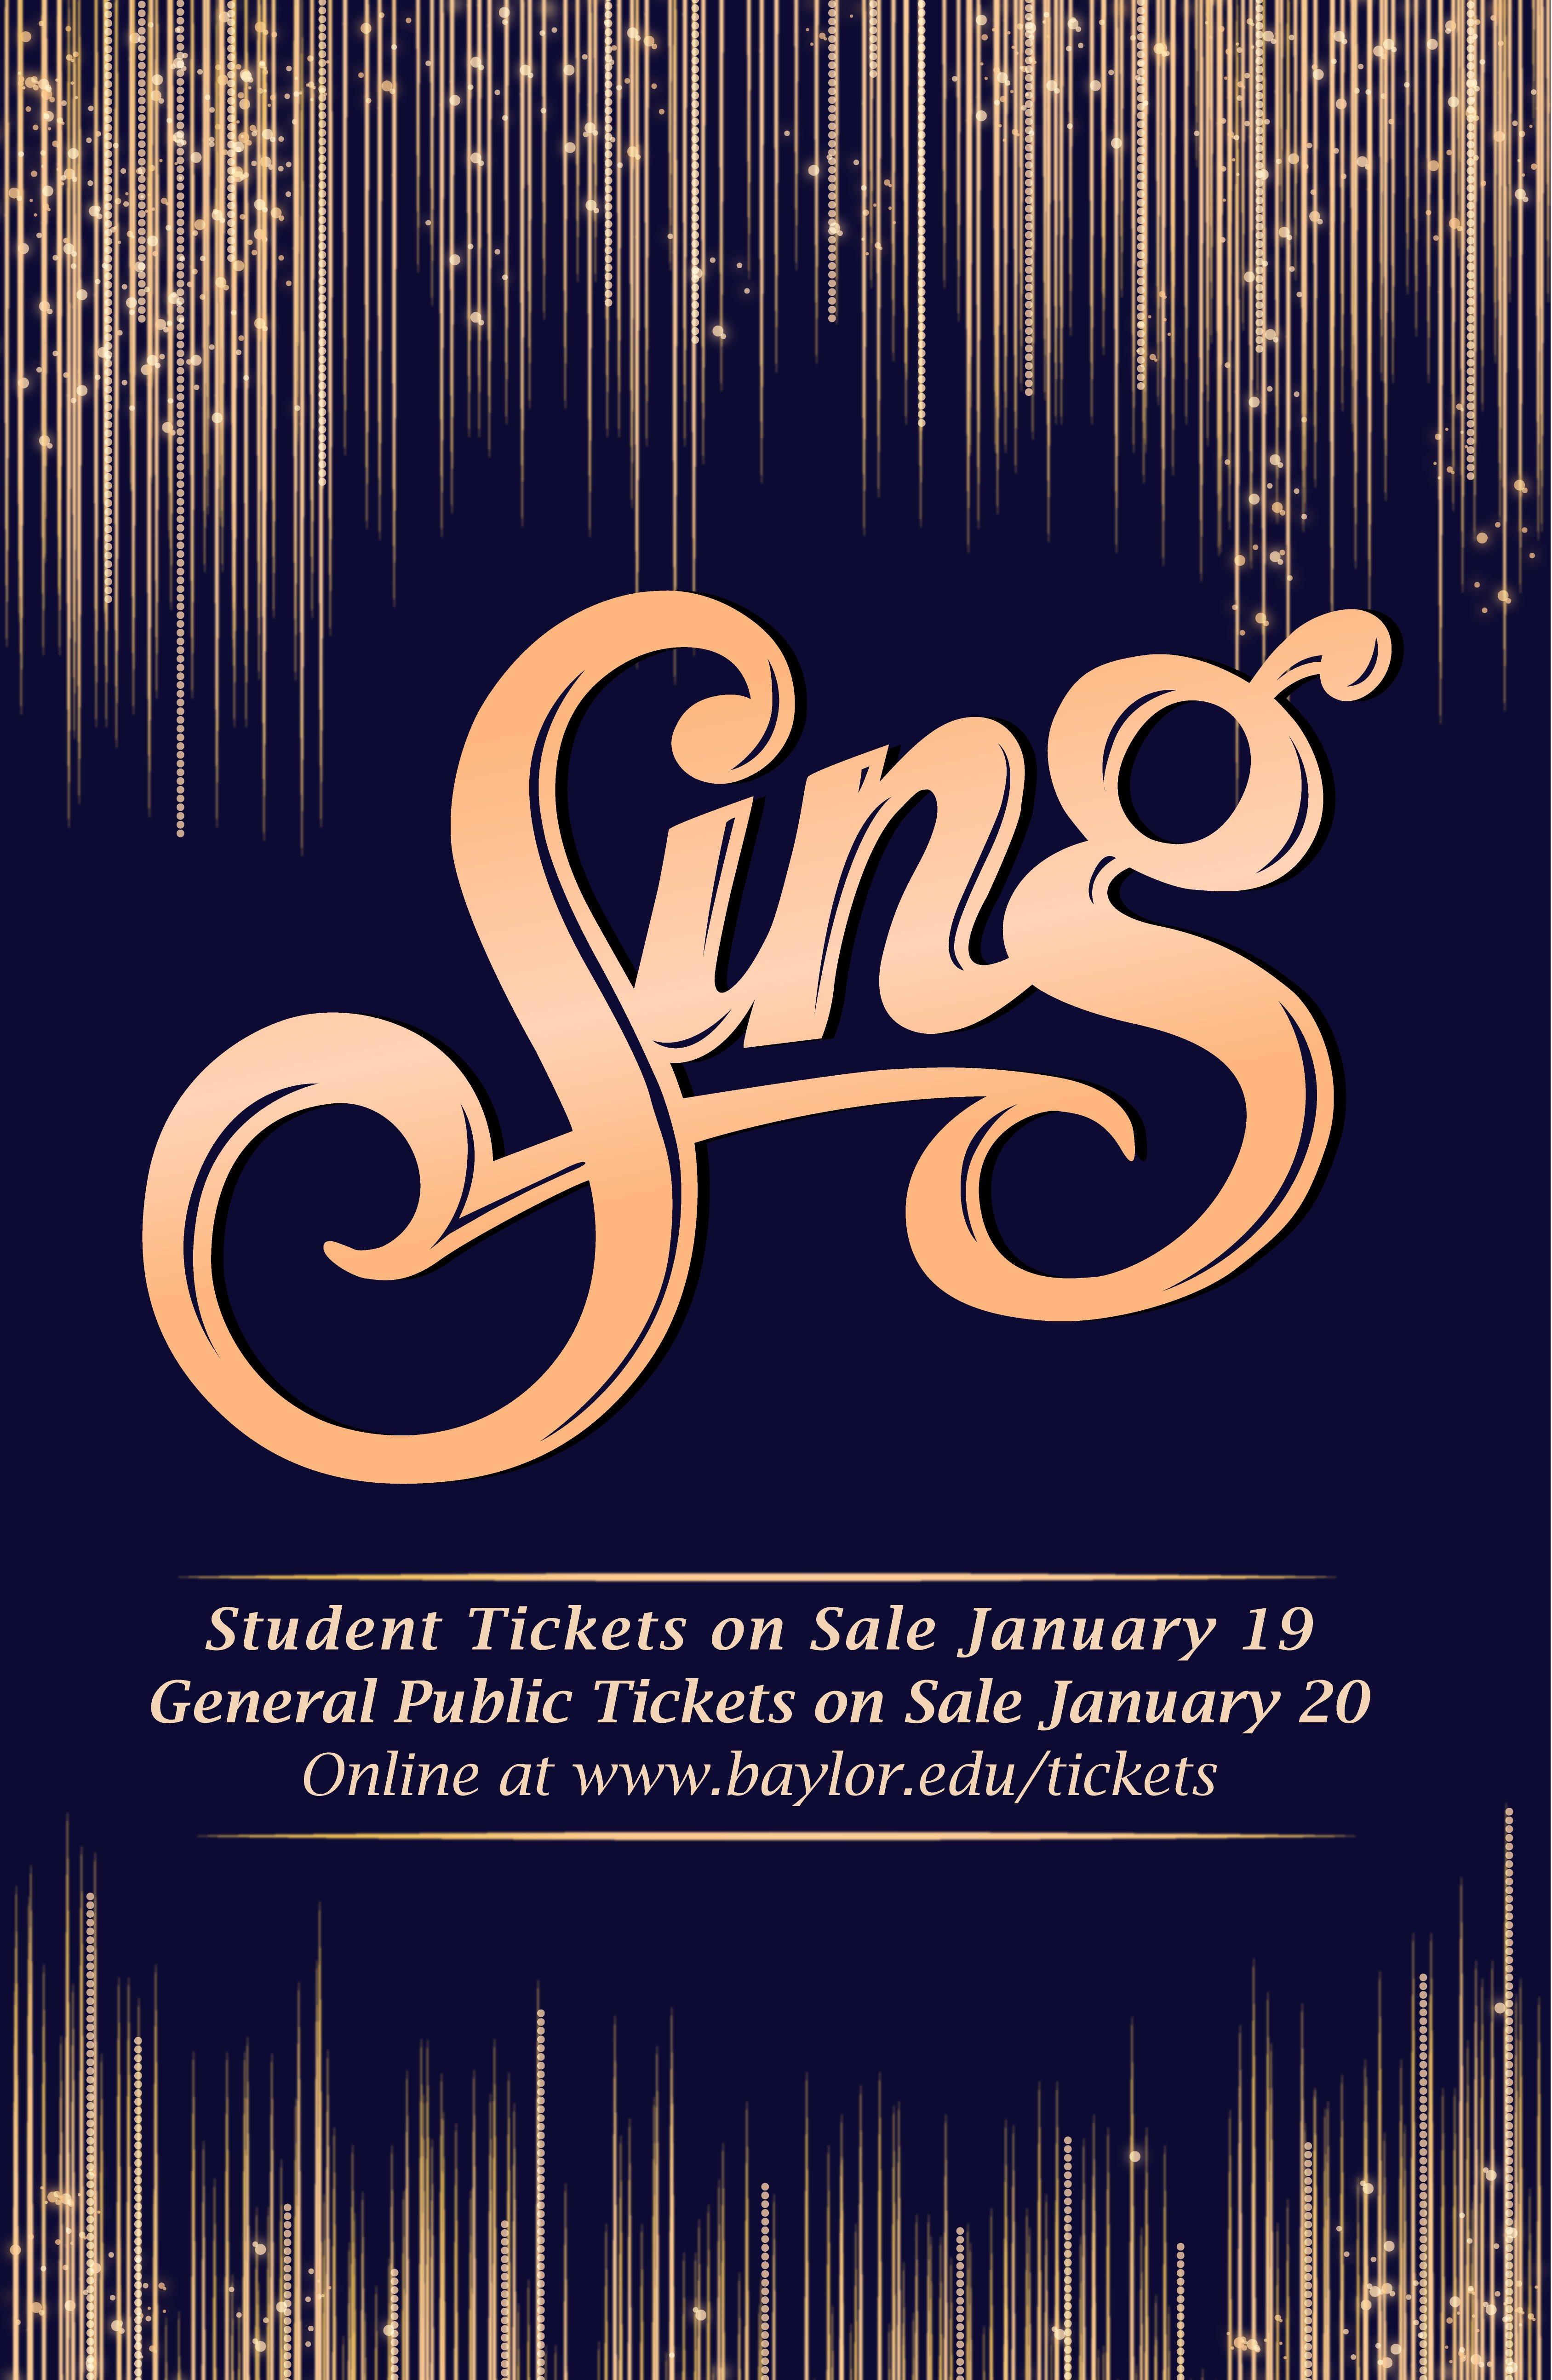 All-University Sing Tickets